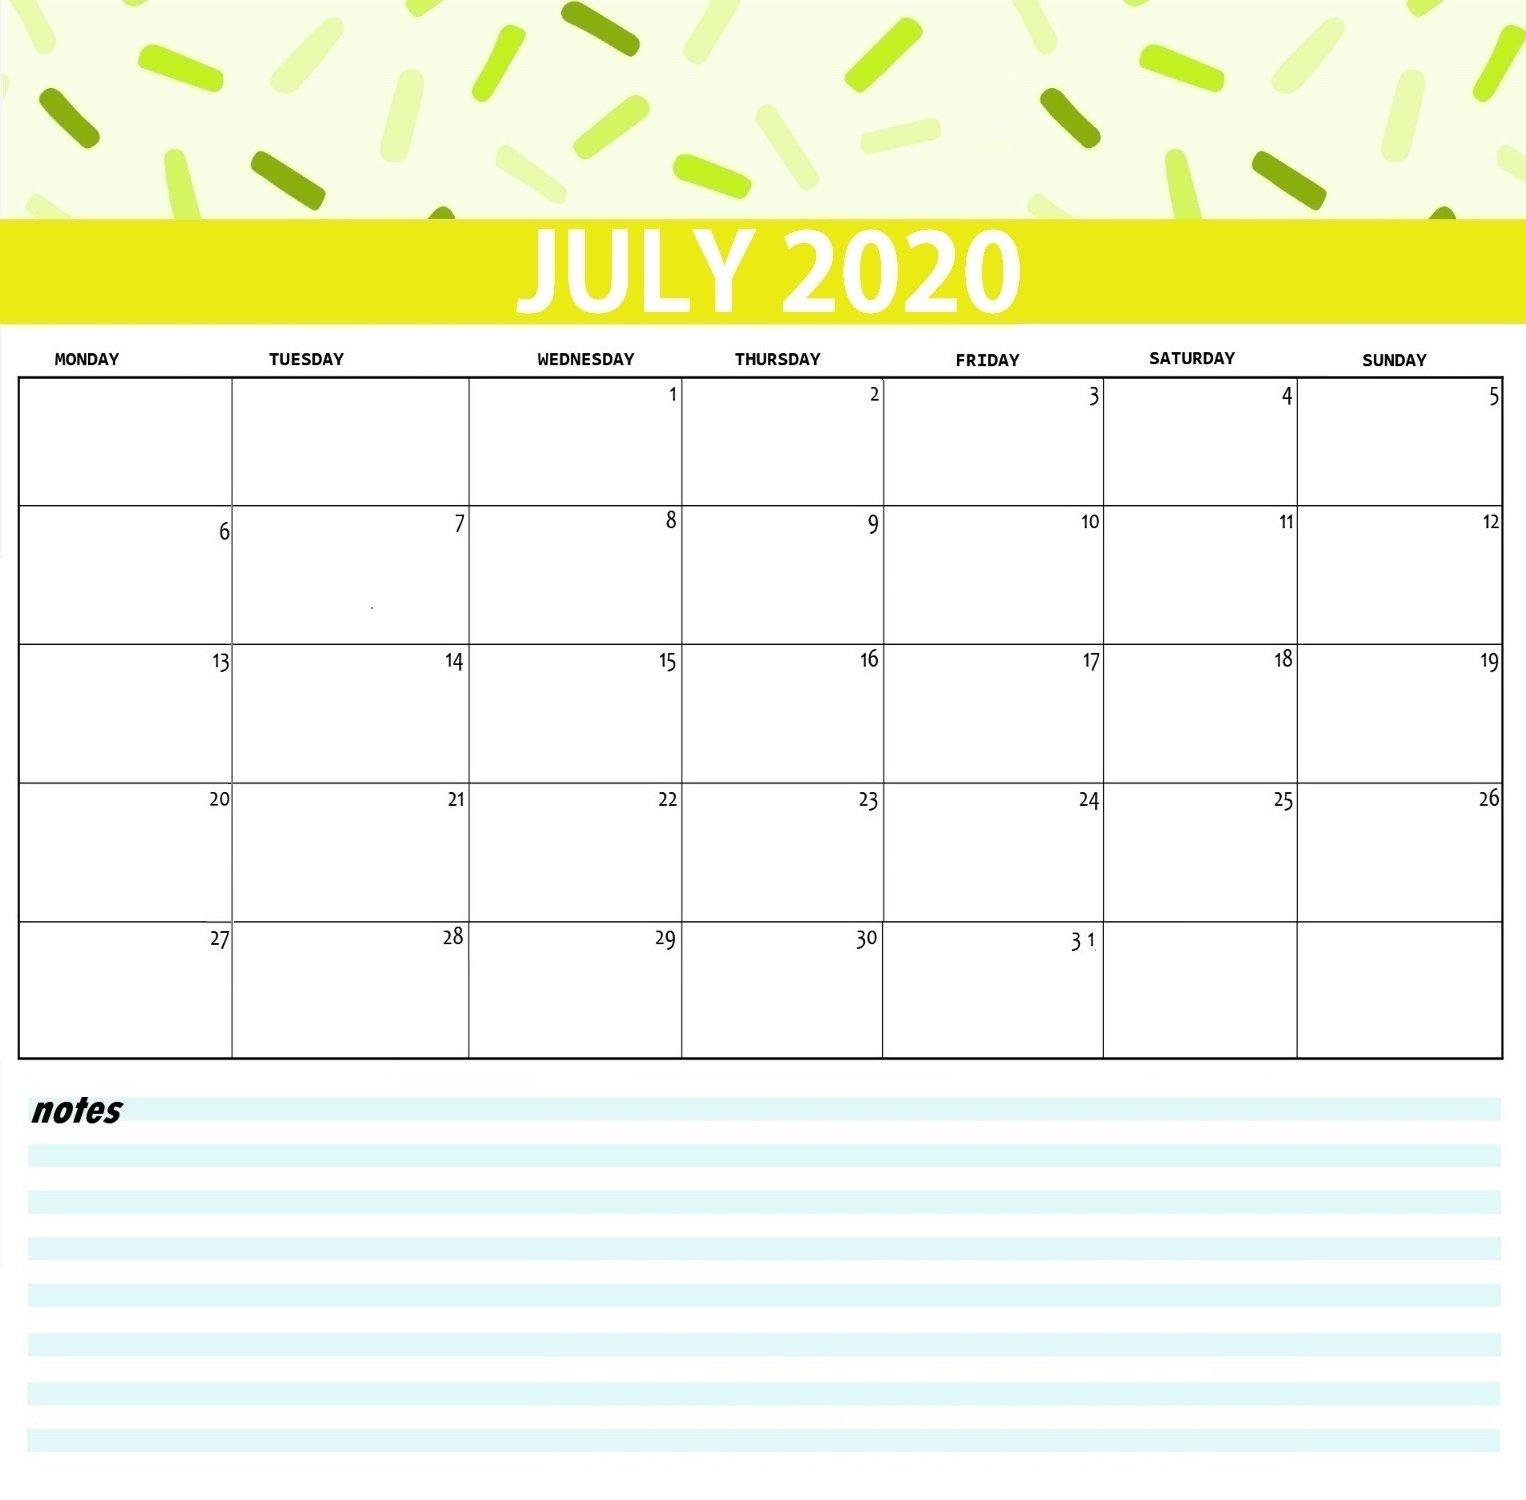 Short Timers Calendar Printable   Calendar Template 2020 Create A Short Timers Calender